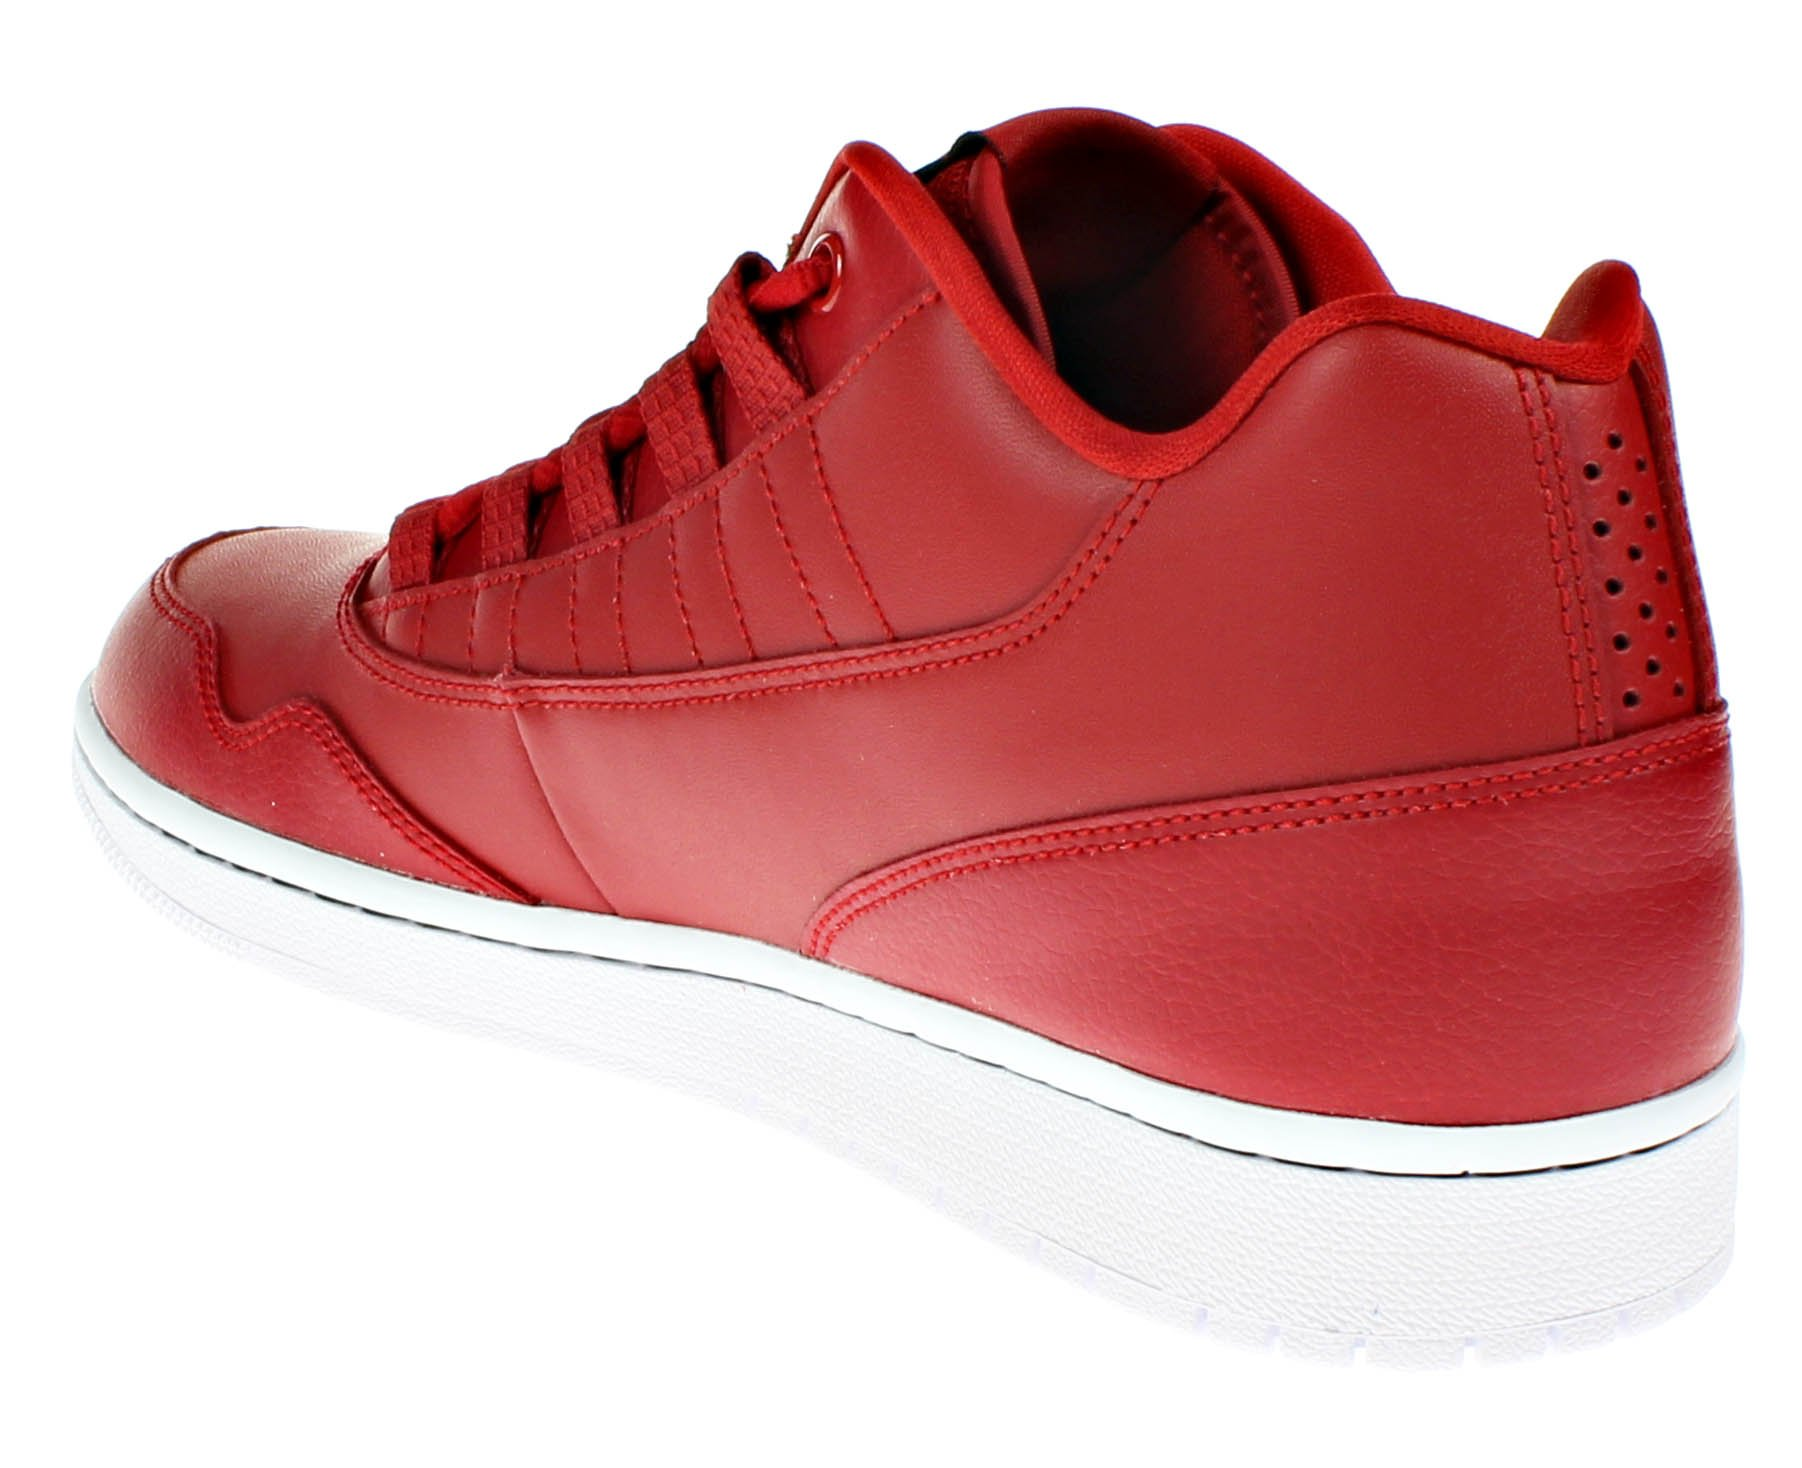 Jordan esecutivo Low Fashion Shoe